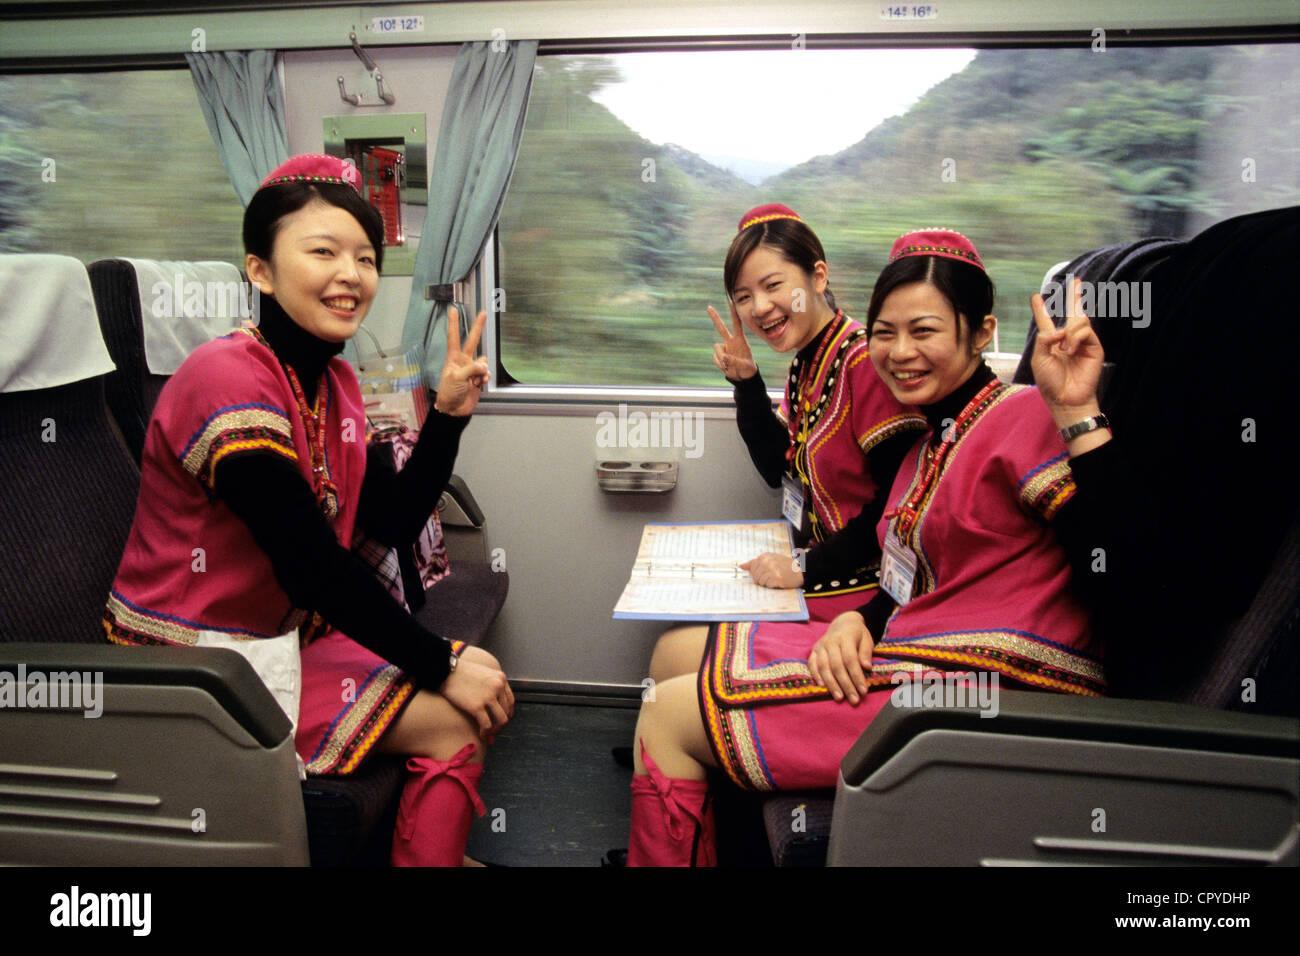 Taiwan, Taichung Municipality, Taichung, Taiwanese train hostesses in local costume - Stock Image